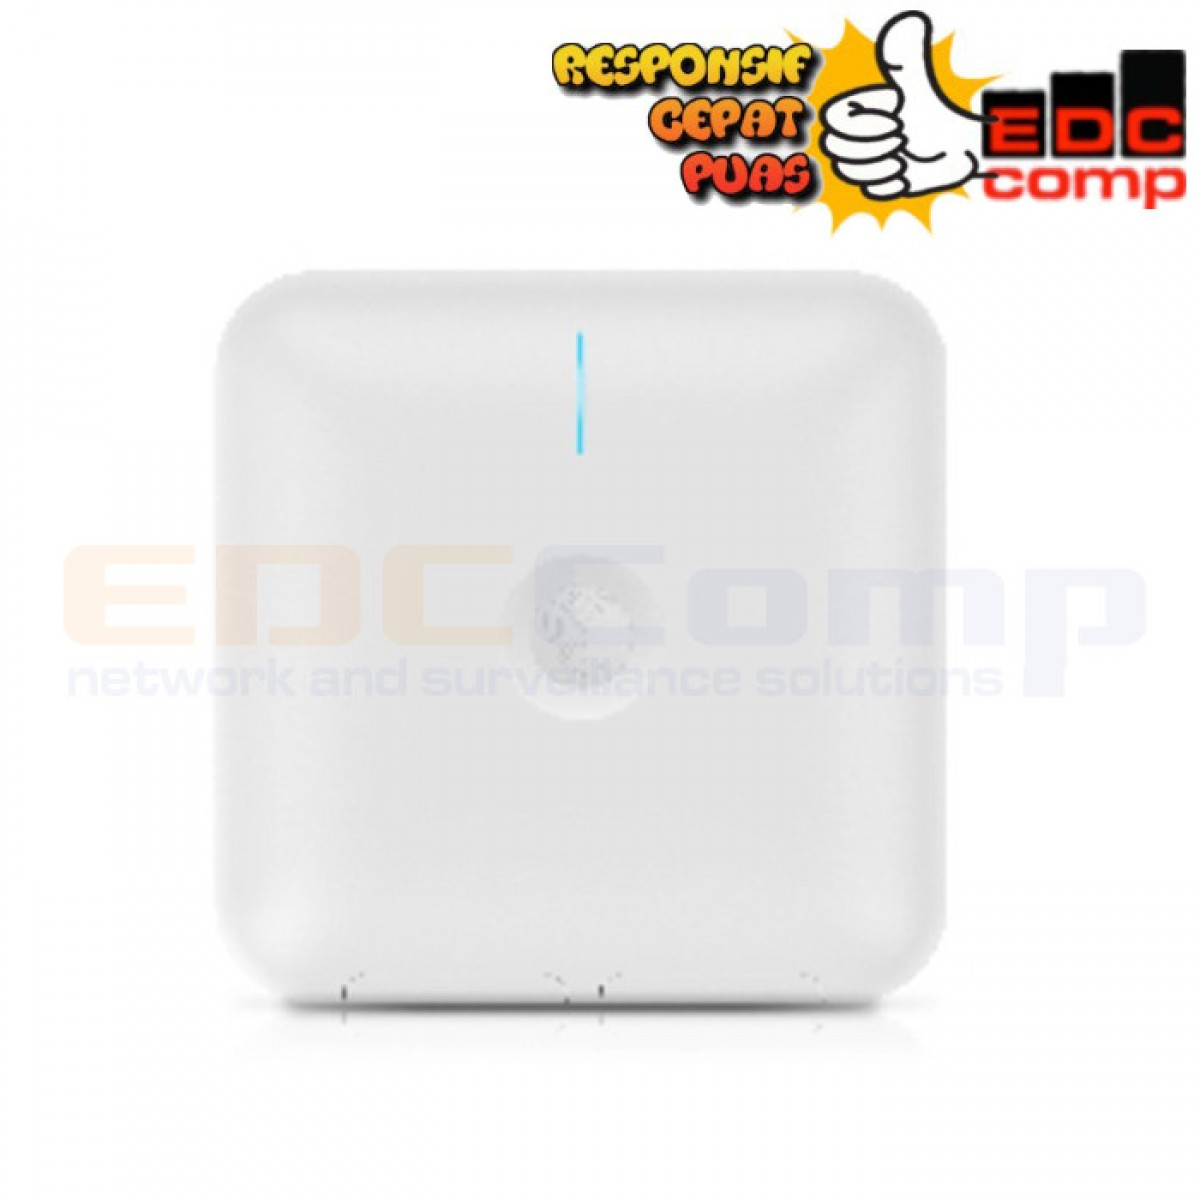 Cambium Networks cnPilot e600 Access Point - EdcComp